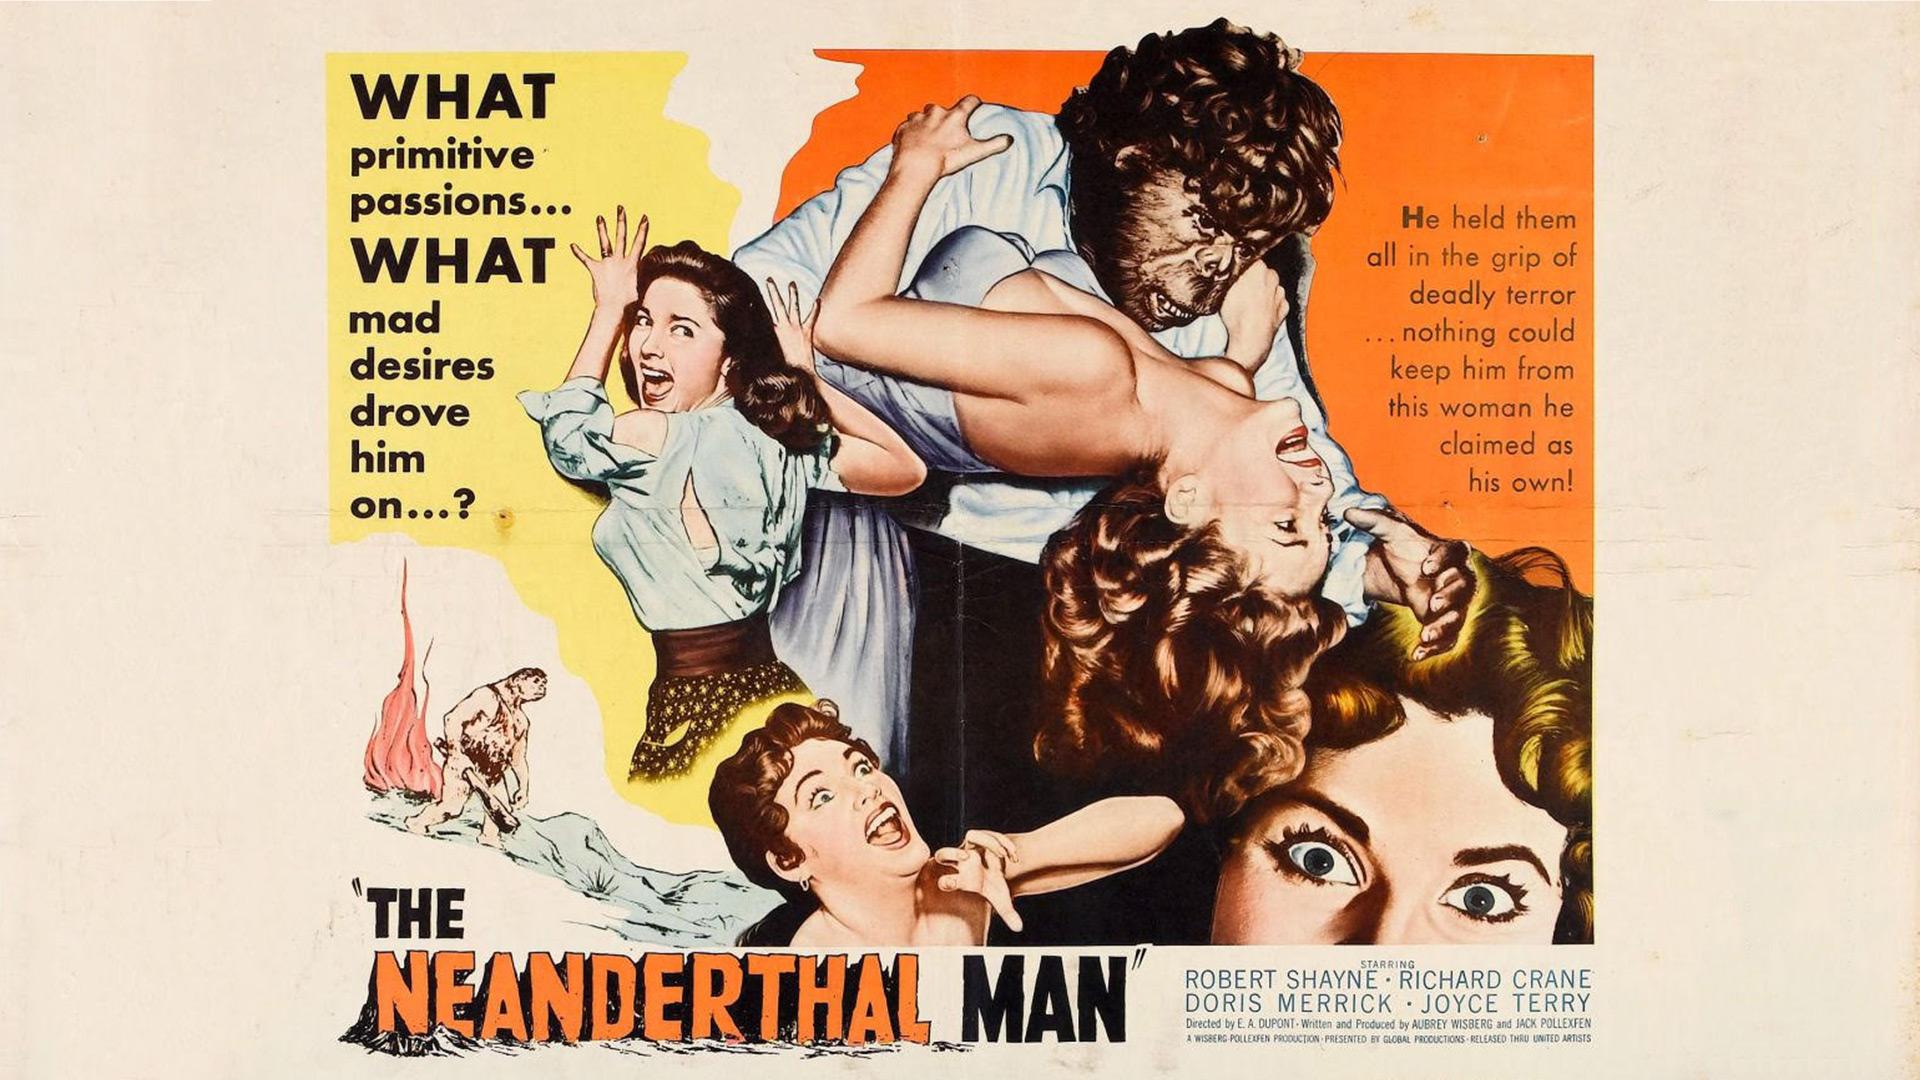 https://mdfilmfest.com/wp-content/uploads/Neanderthal-Man_Poster_WEB_01.jpg